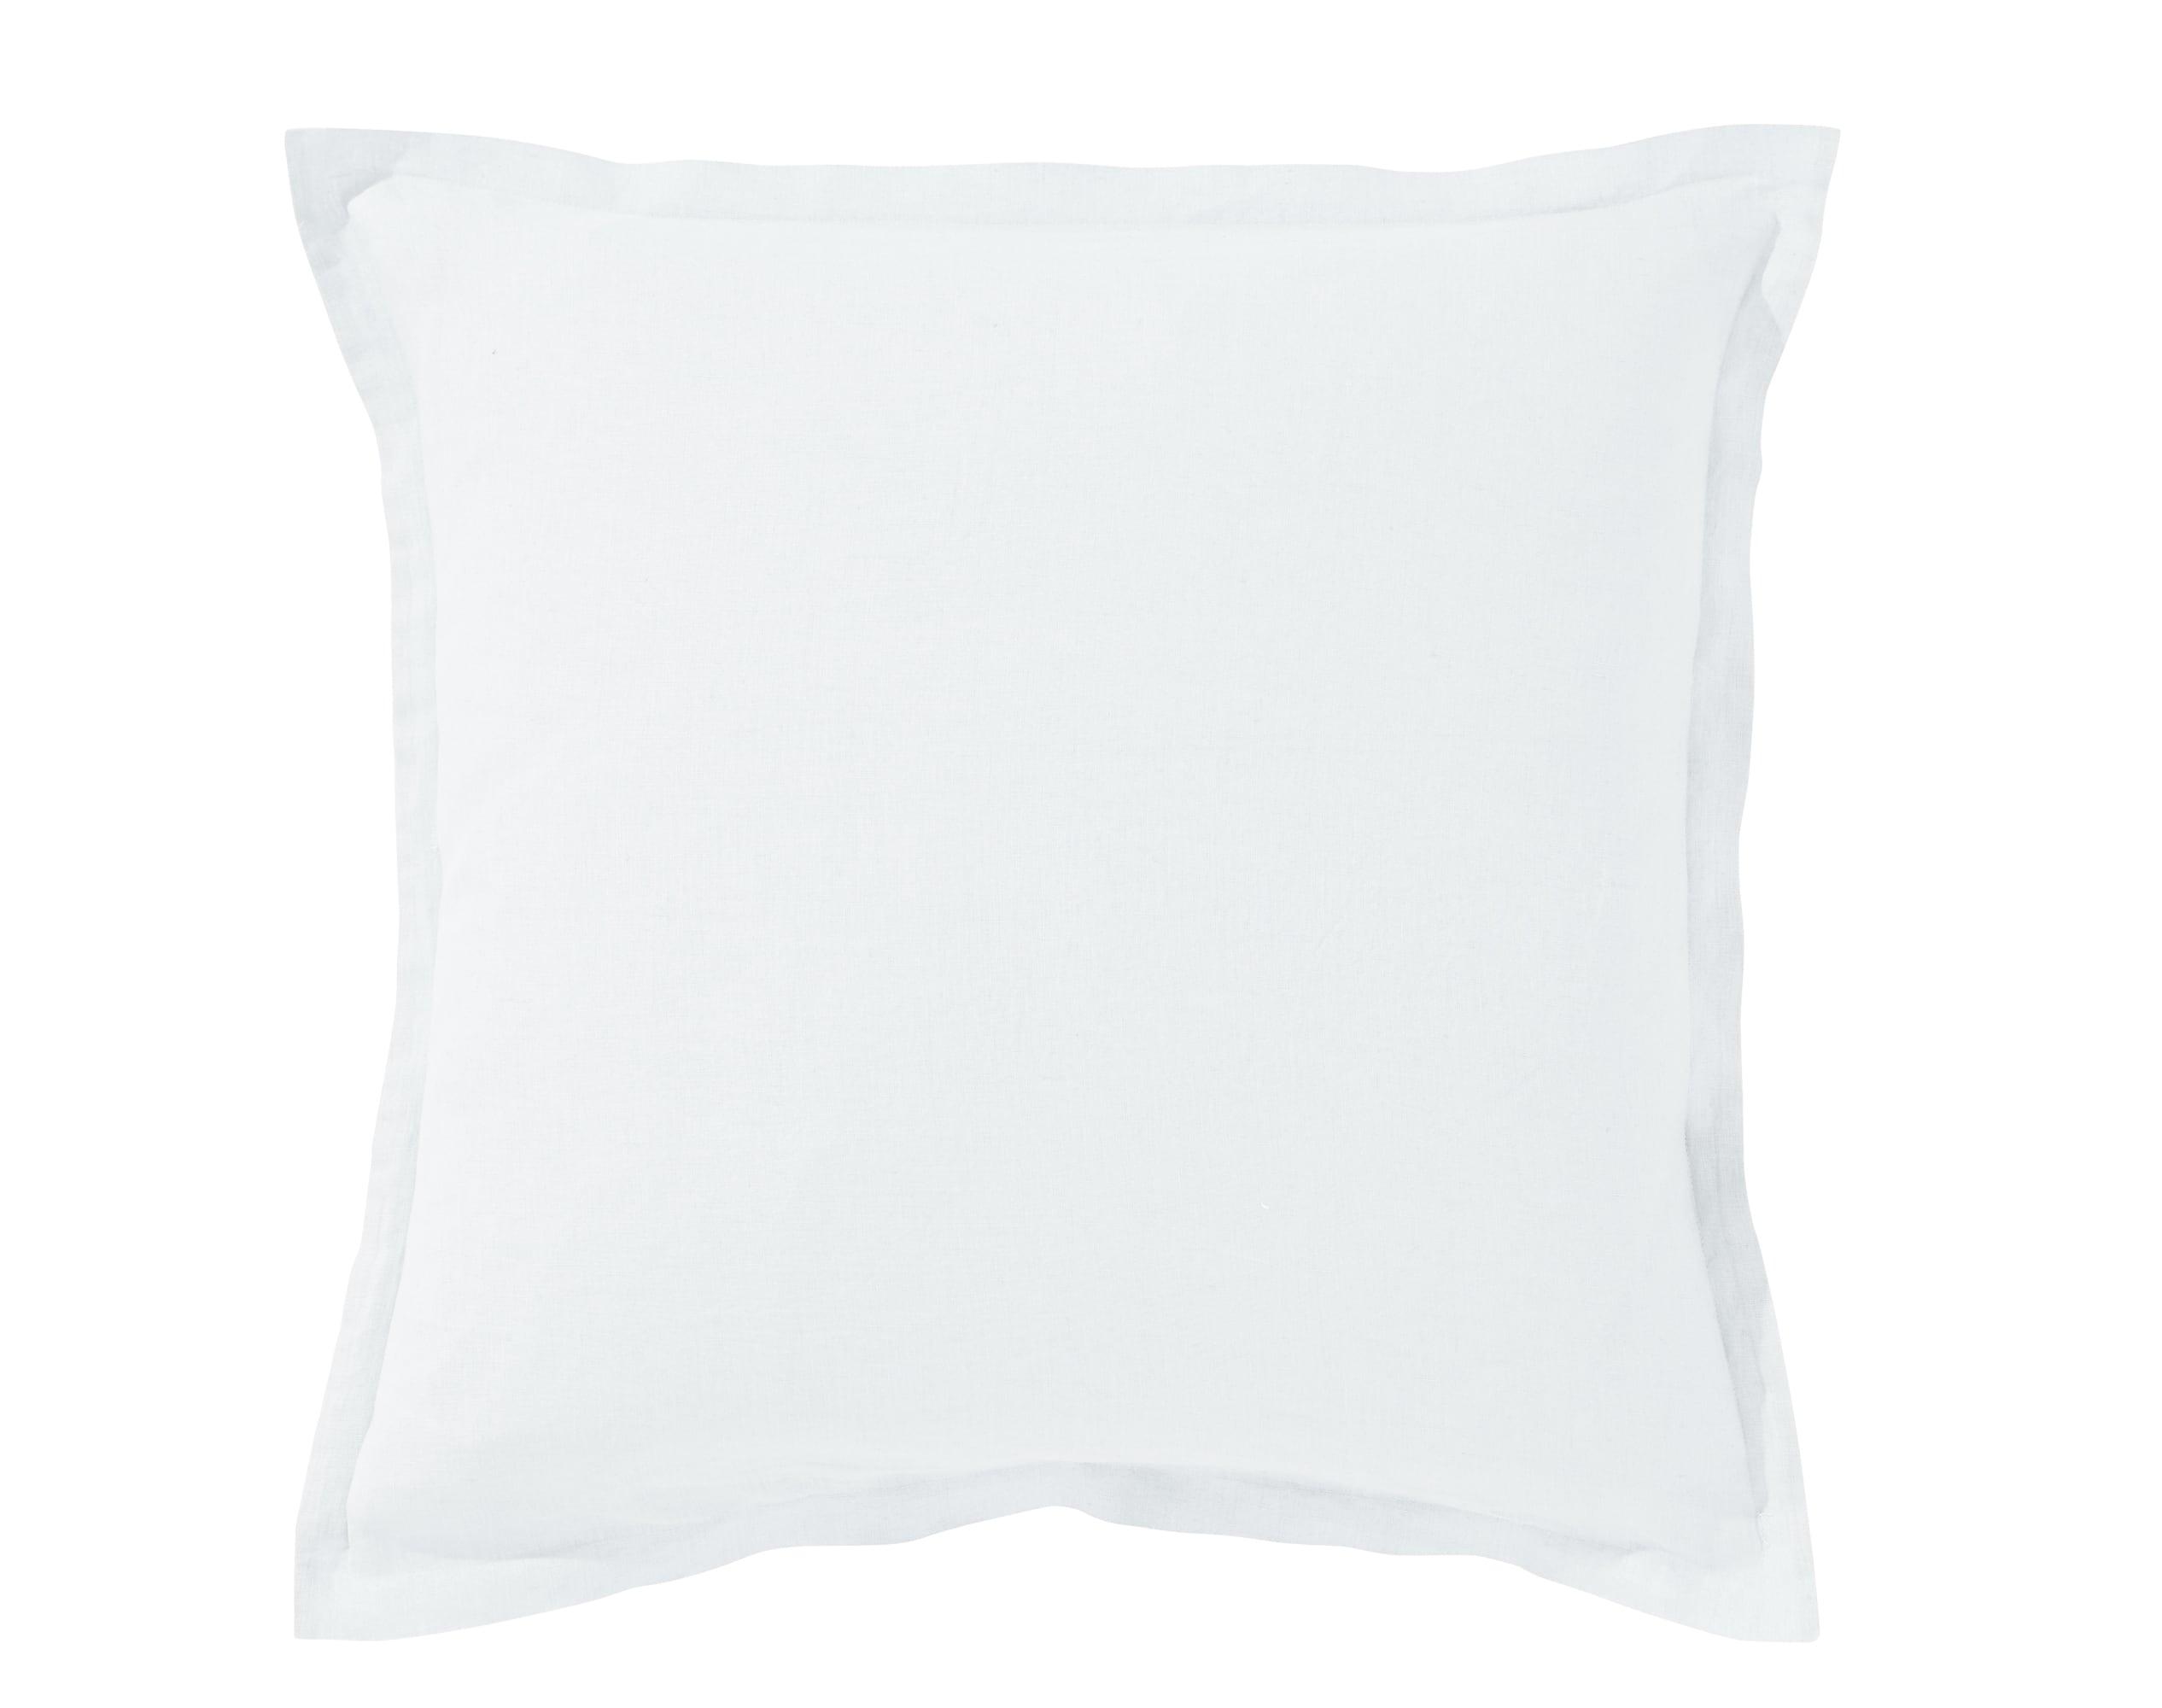 Taie d'oreiller 50x70 en lin lavé blanc